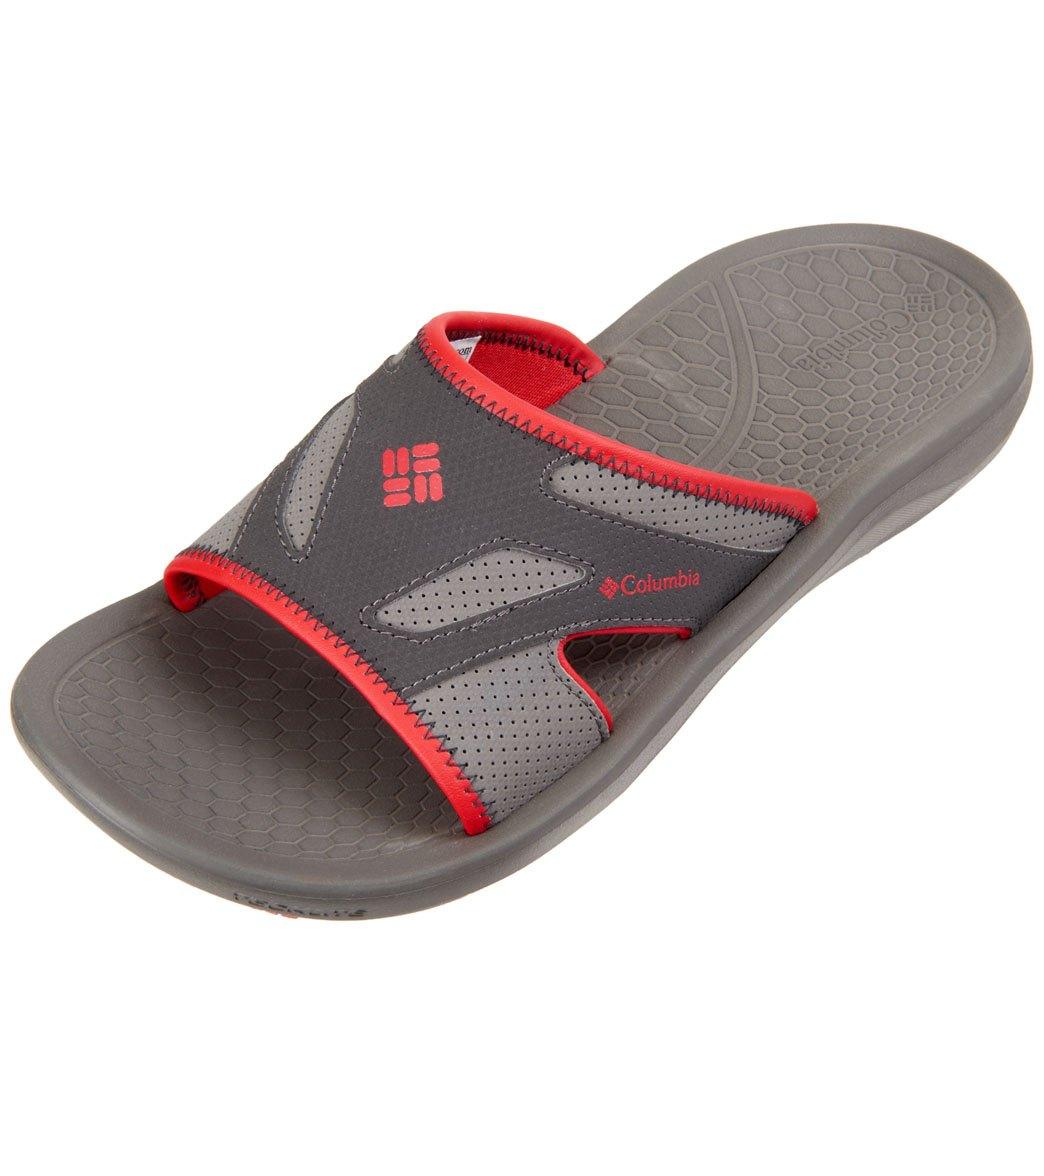 79949b26fdb Columbia Men s Techsun Slide Sandal at SwimOutlet.com